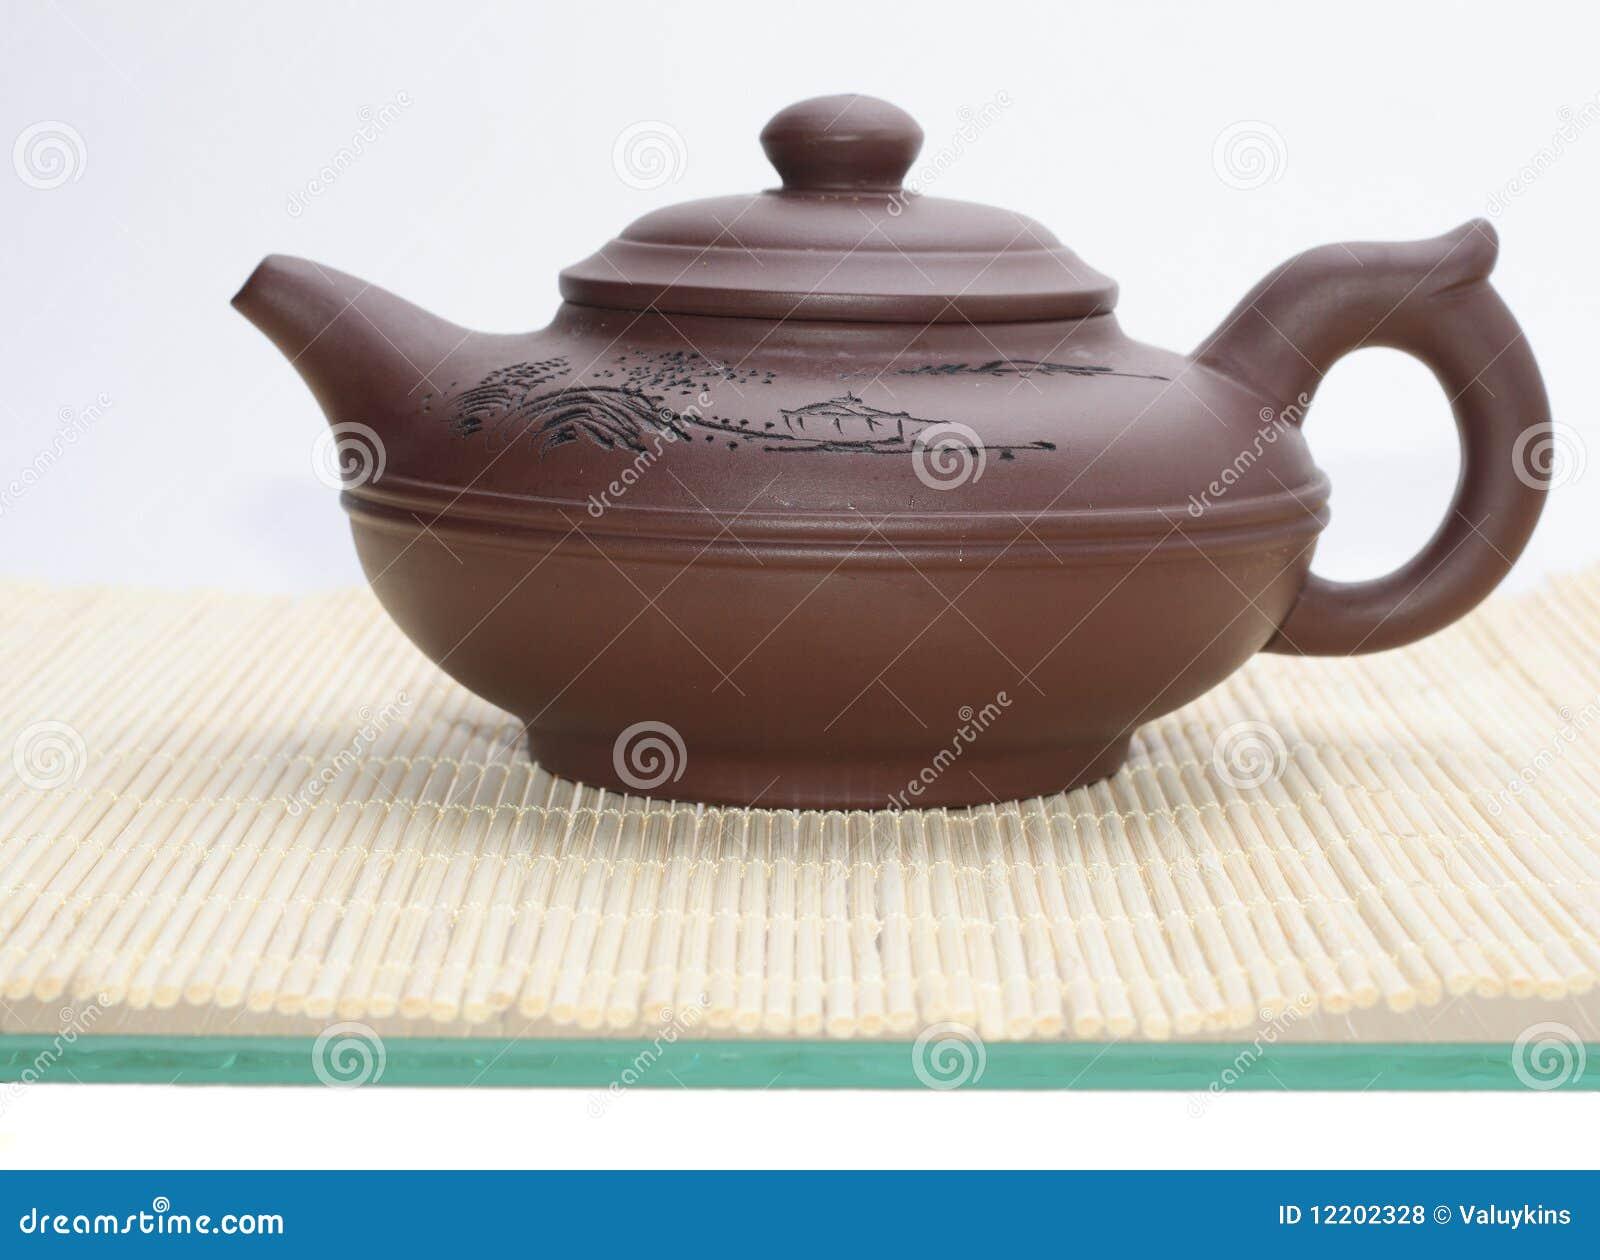 Asiatische Teekanne